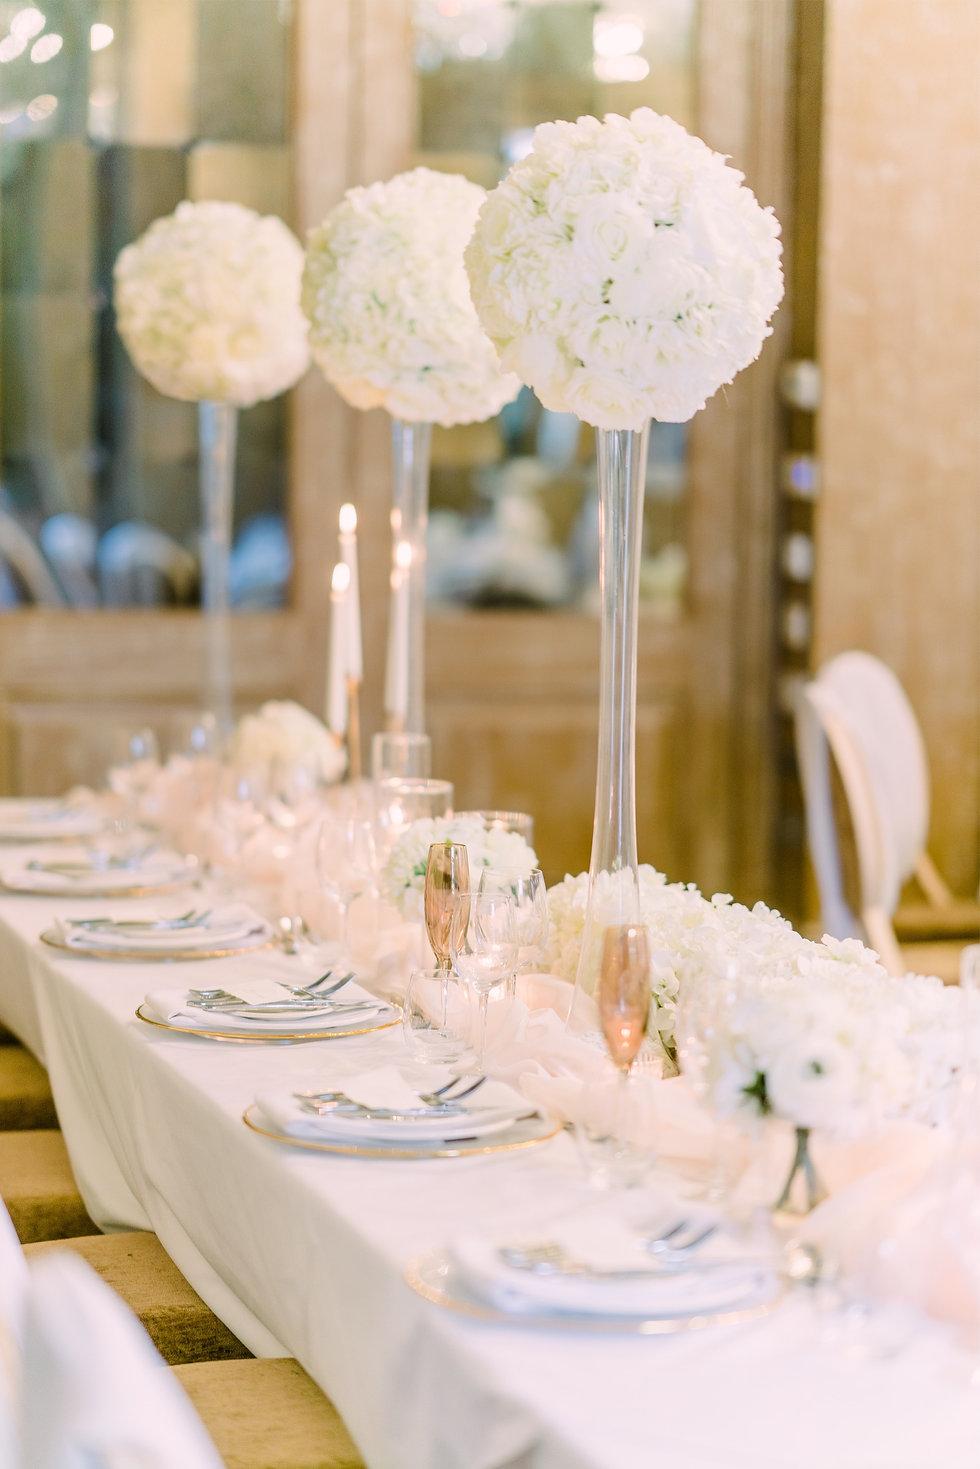 Fawsley Hall Daventry Wedding By Ioana P